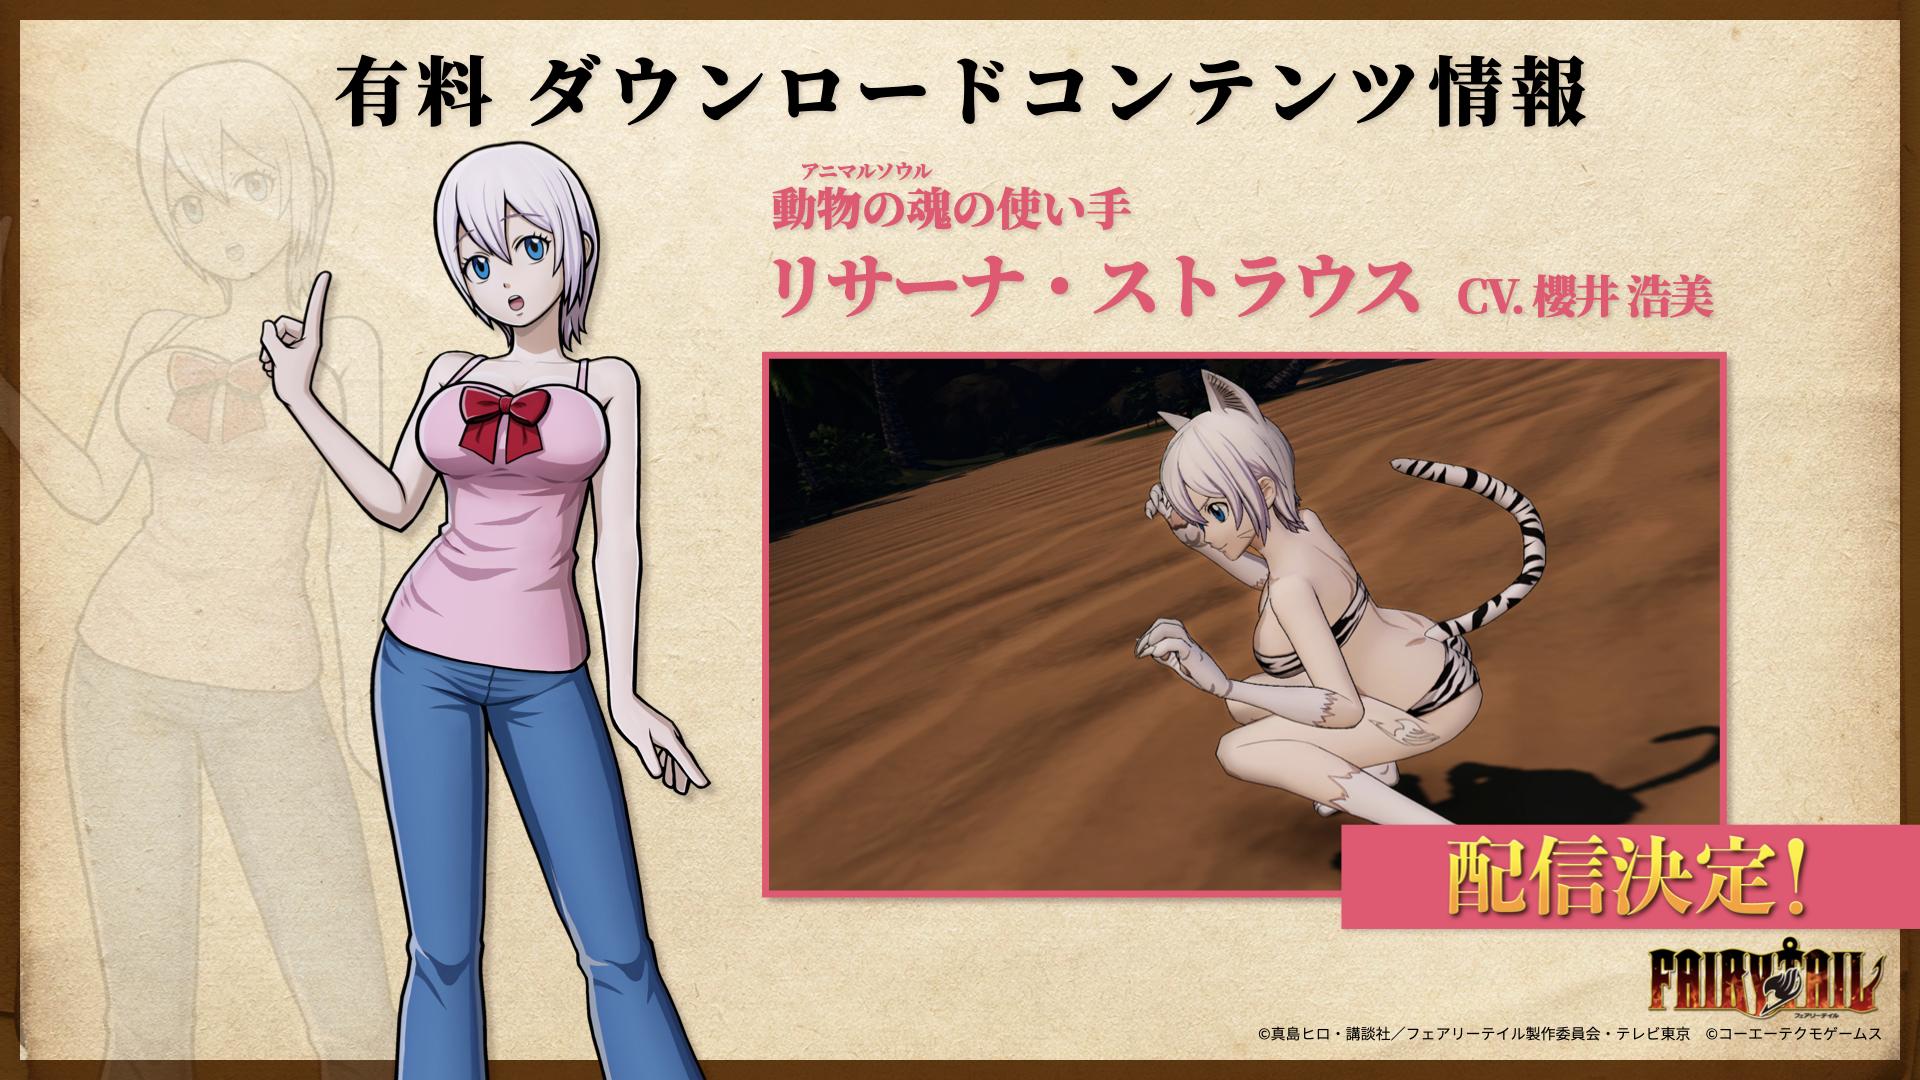 Lisanna Strauss Fairy Tail RPG Lyon, Levy, Lisanna, and Elfman as DLC, Photo Mode Update